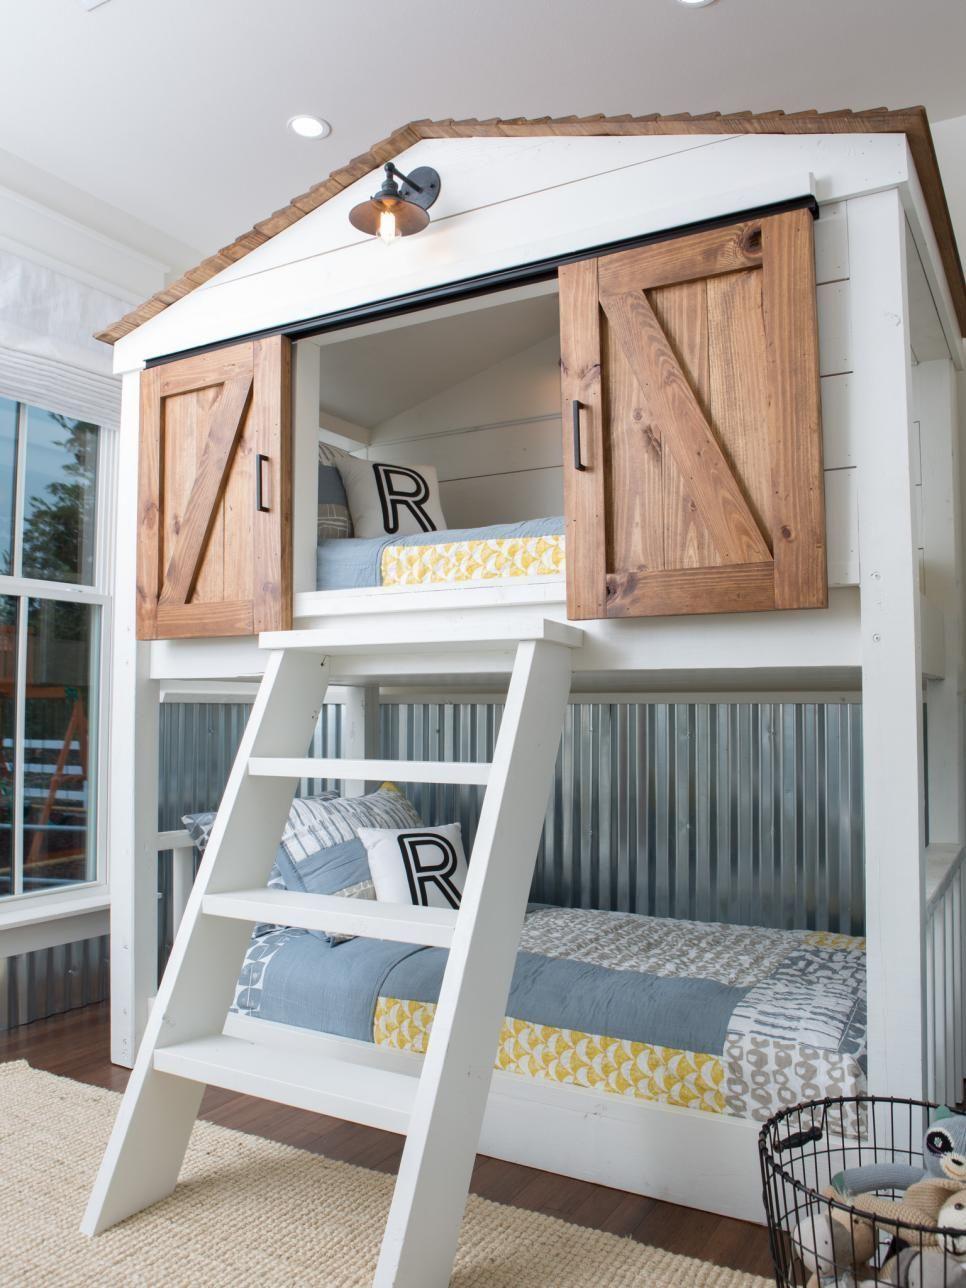 Creative loft bed ideas  Une incroyable rénovation PLANETE DECO a homes world  Kids room